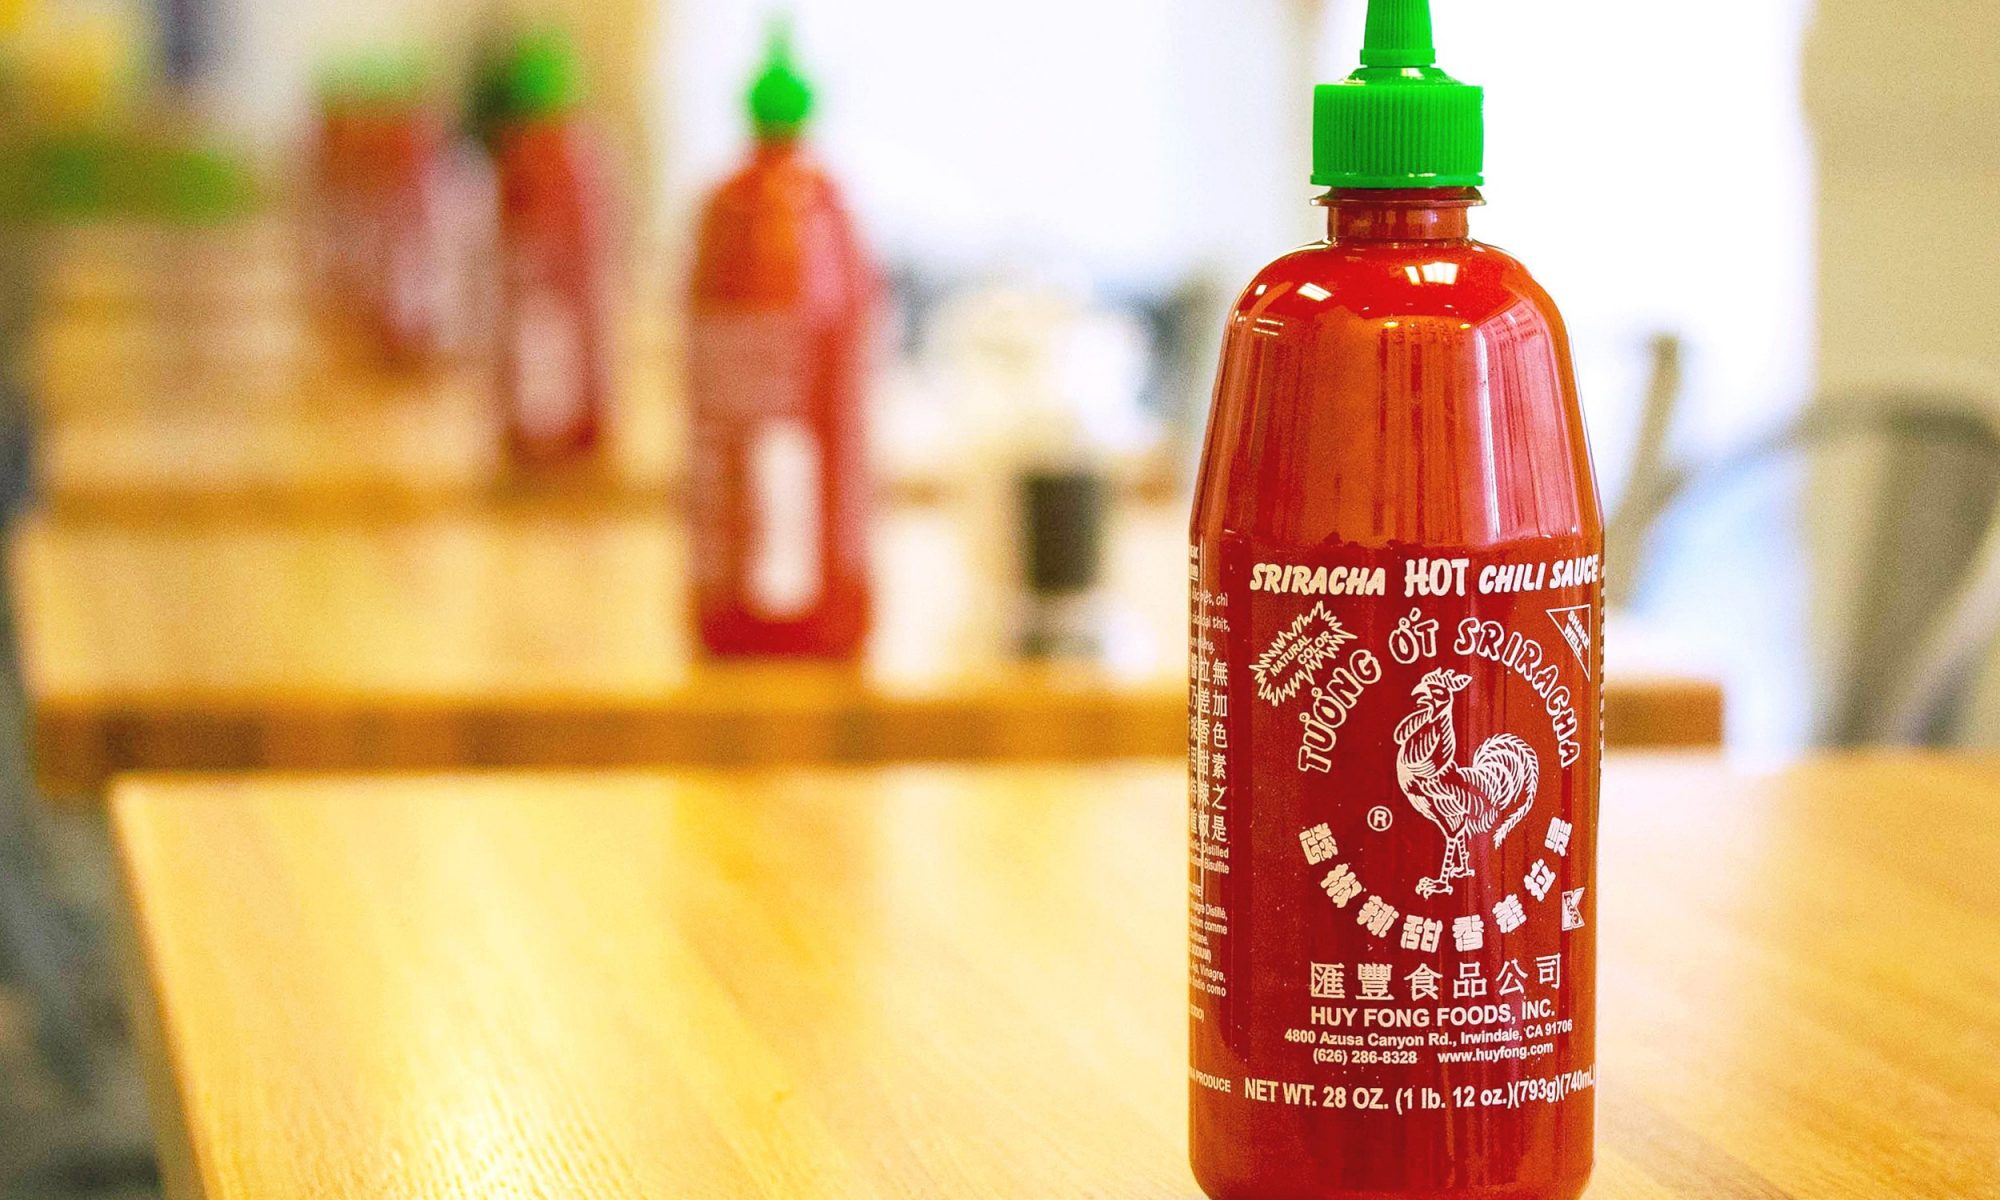 EC: Seattle Woman Gets Stiffed on Sriracha, Calls Cops